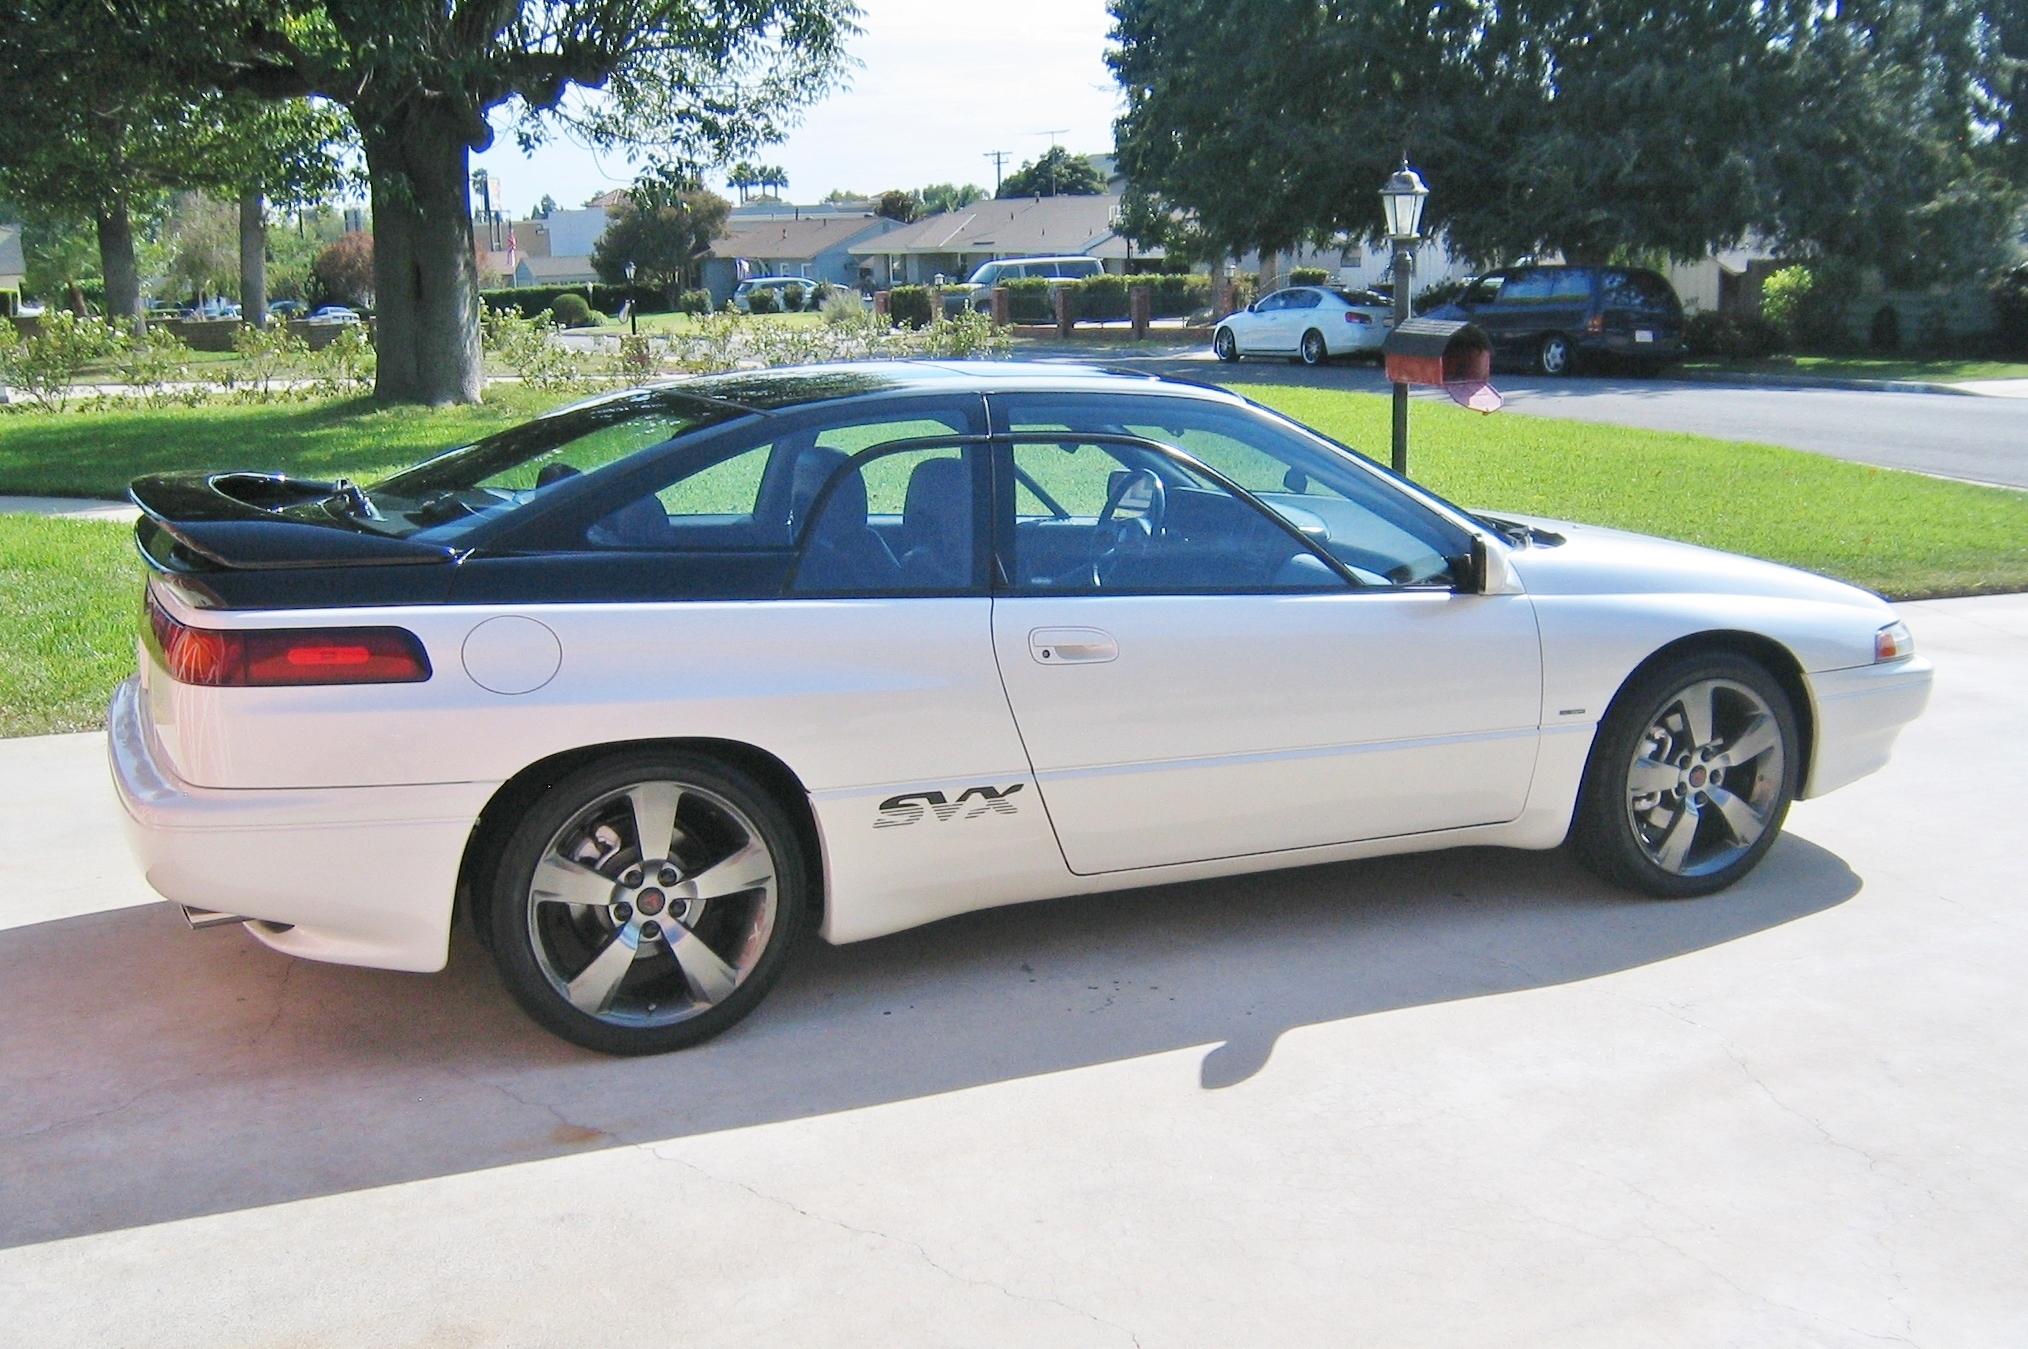 Customized Subaru Svx